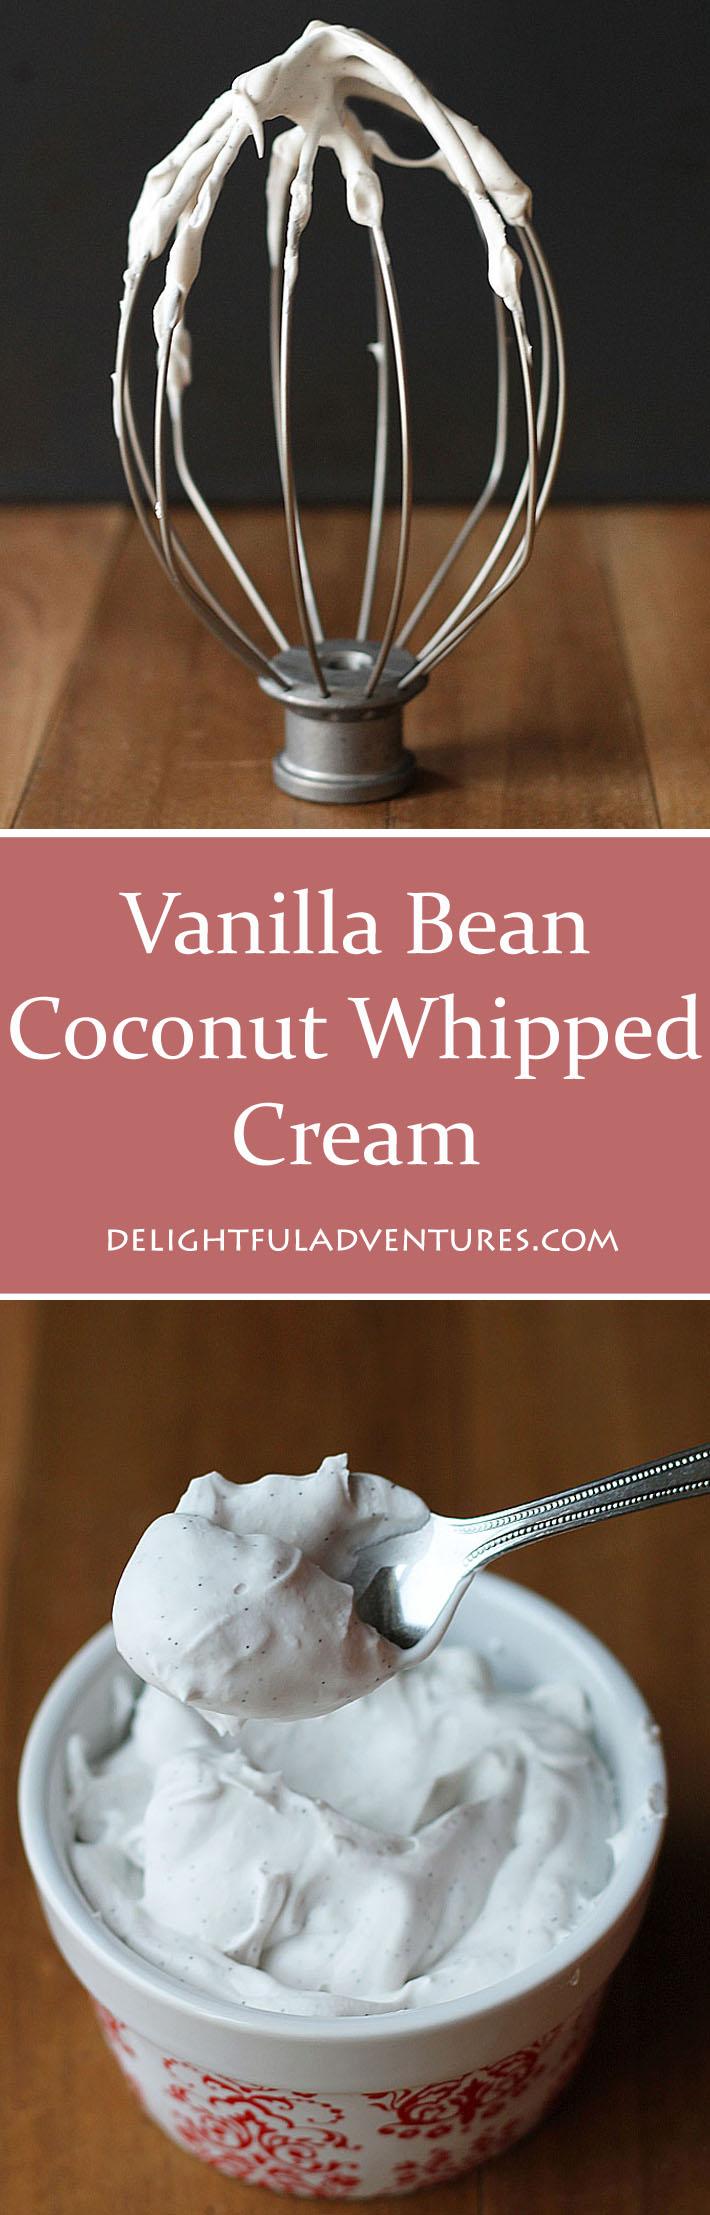 Vanilla Bean Coconut Whipped Cream